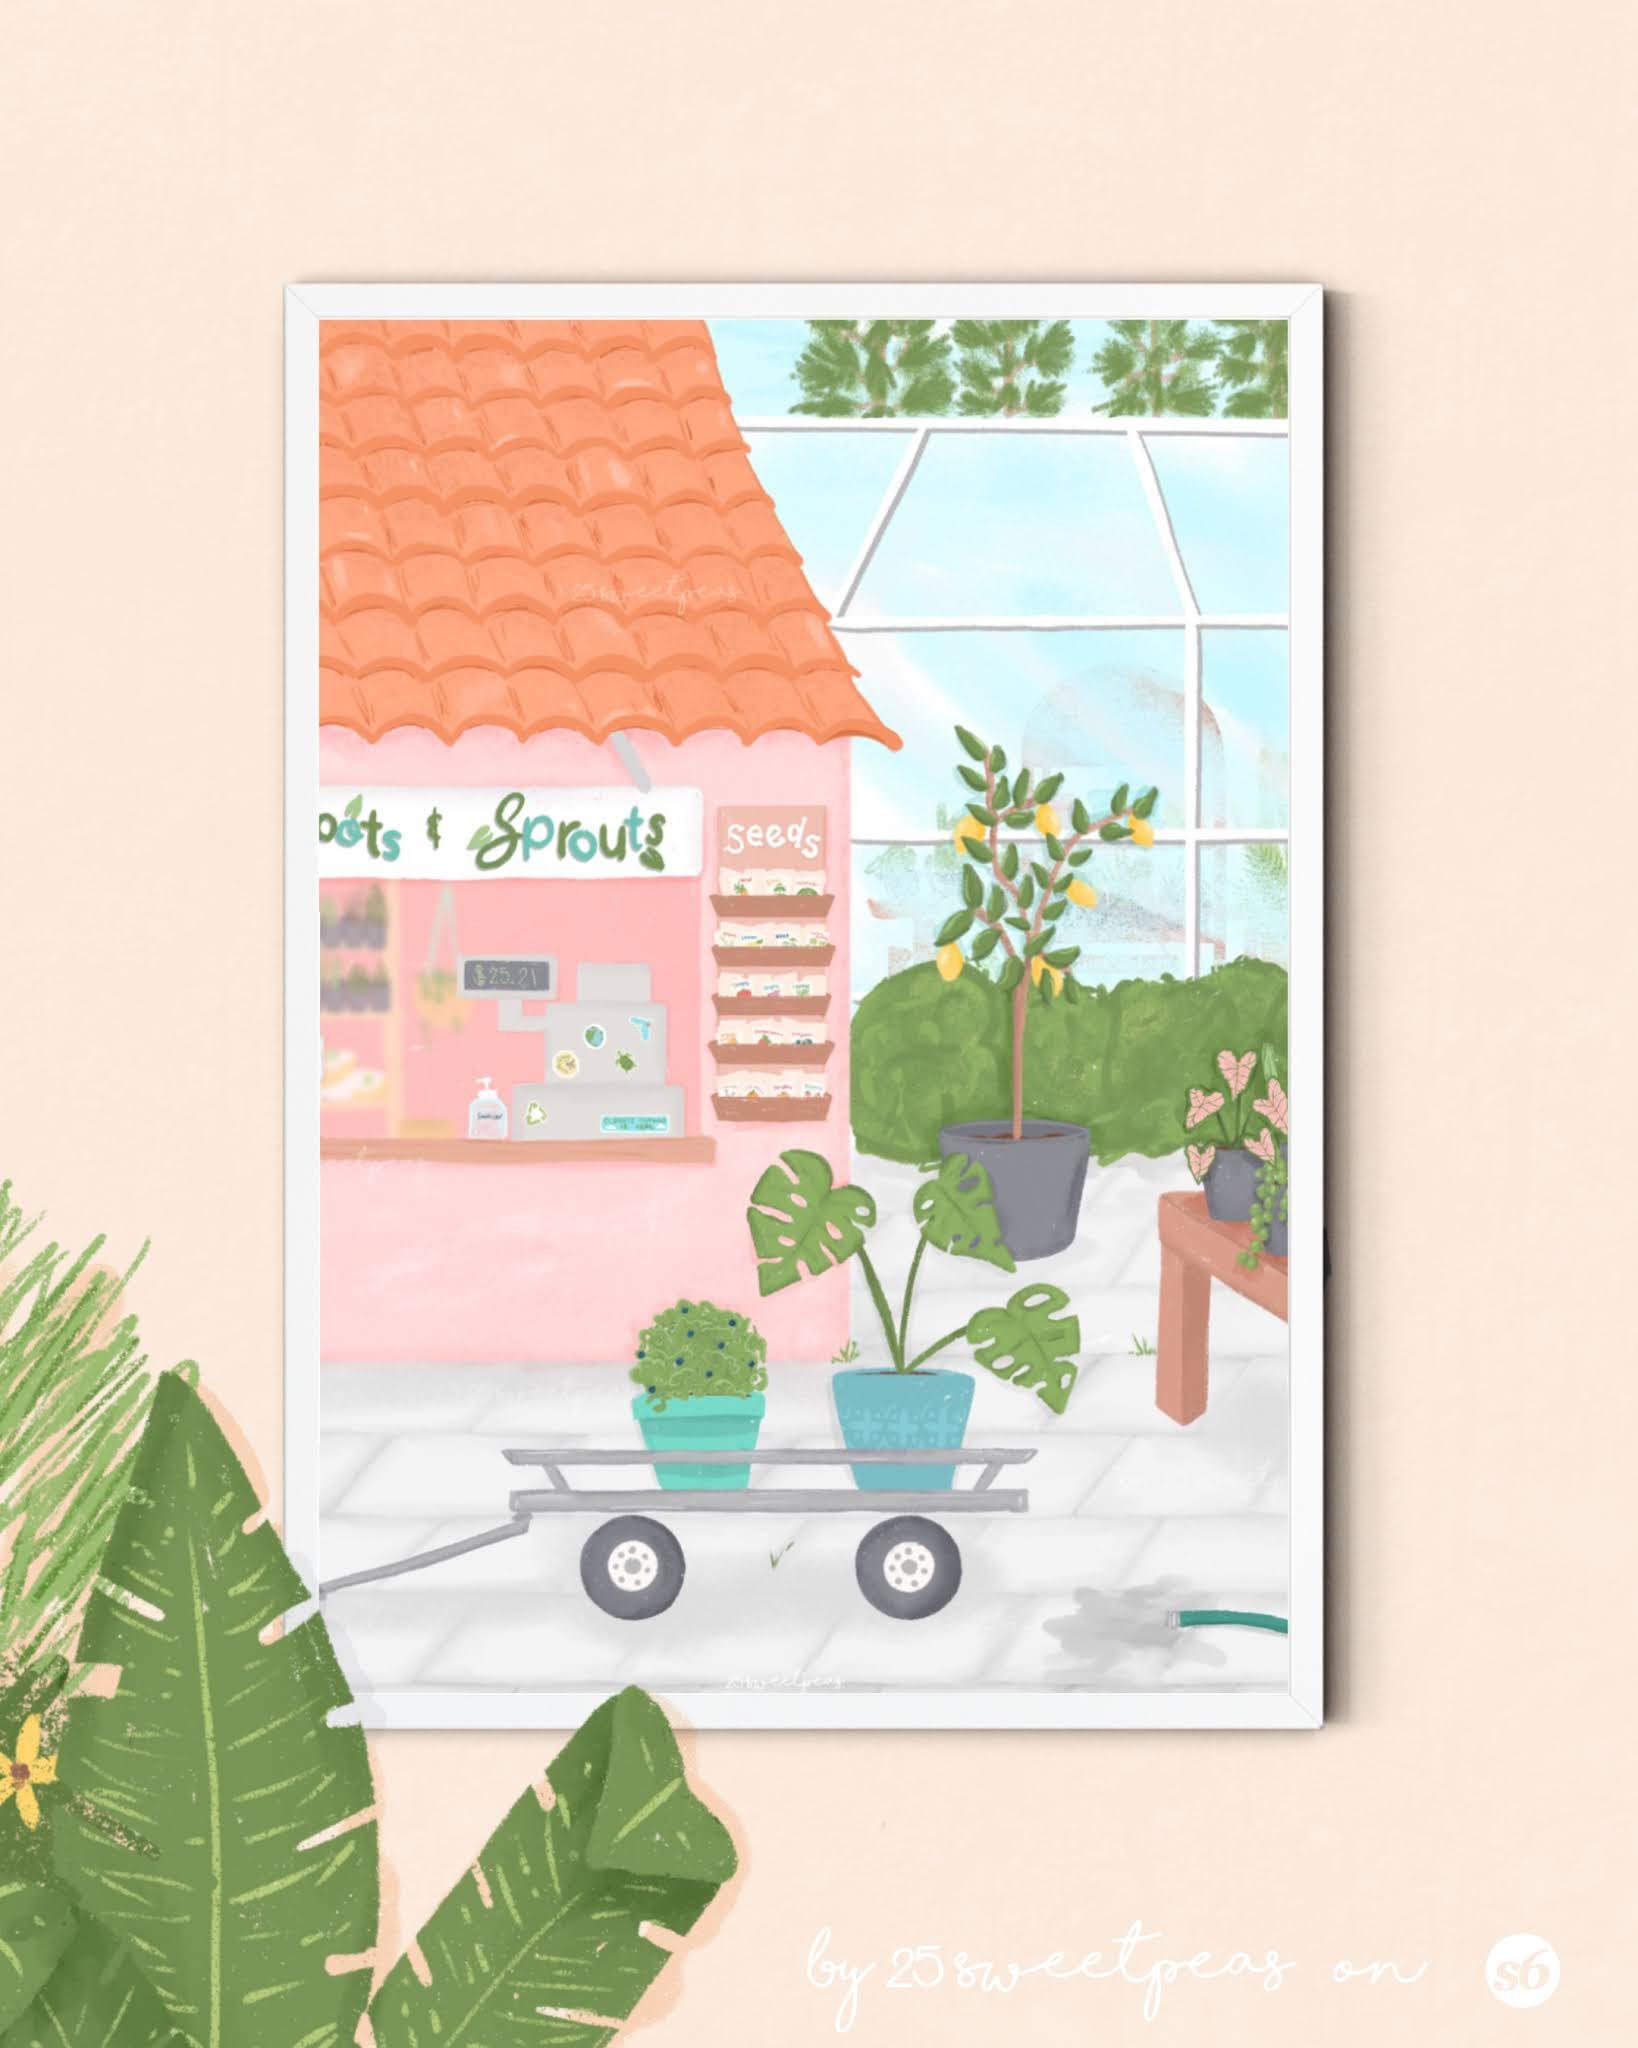 New Garden Shop Prints   25 Sweetpeas by Sarah